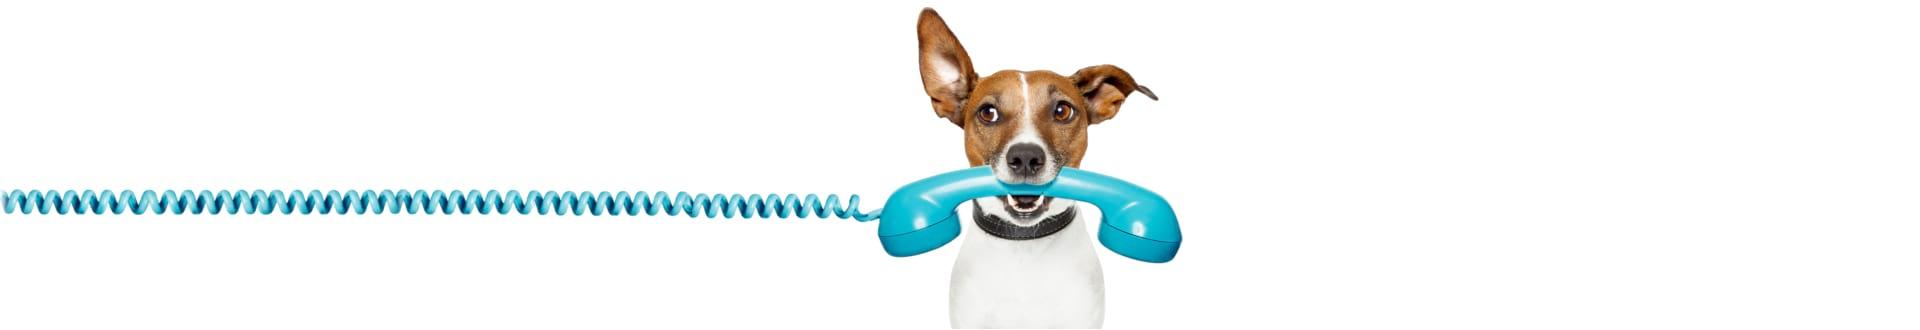 dog biting a telephone